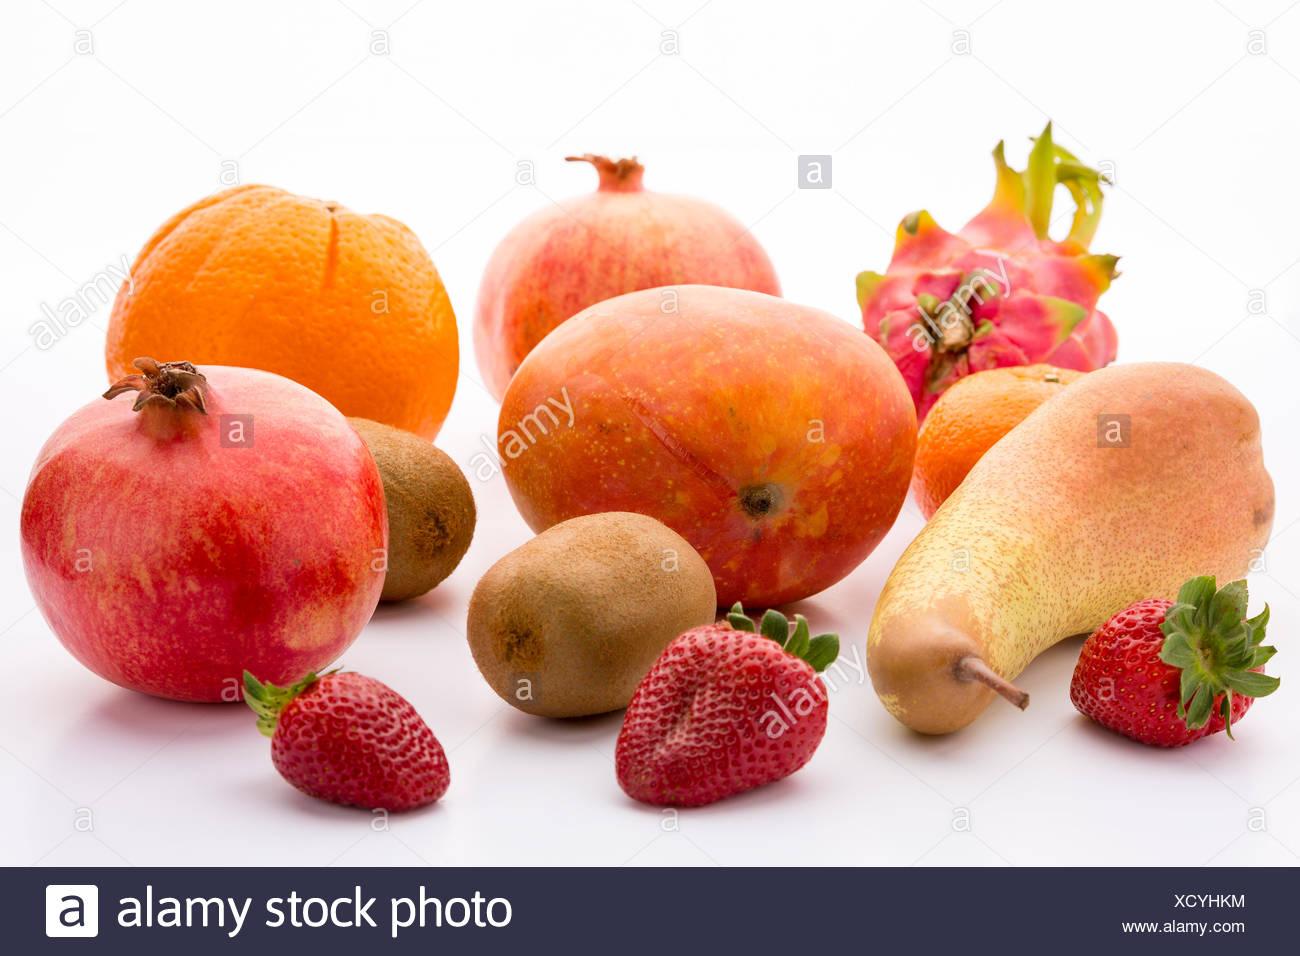 Exotic and domestic fruits: mango, two pomegranates, one pitaya, two kiwifruits, a pear, three garden strawberries and one mandarin. - Stock Image